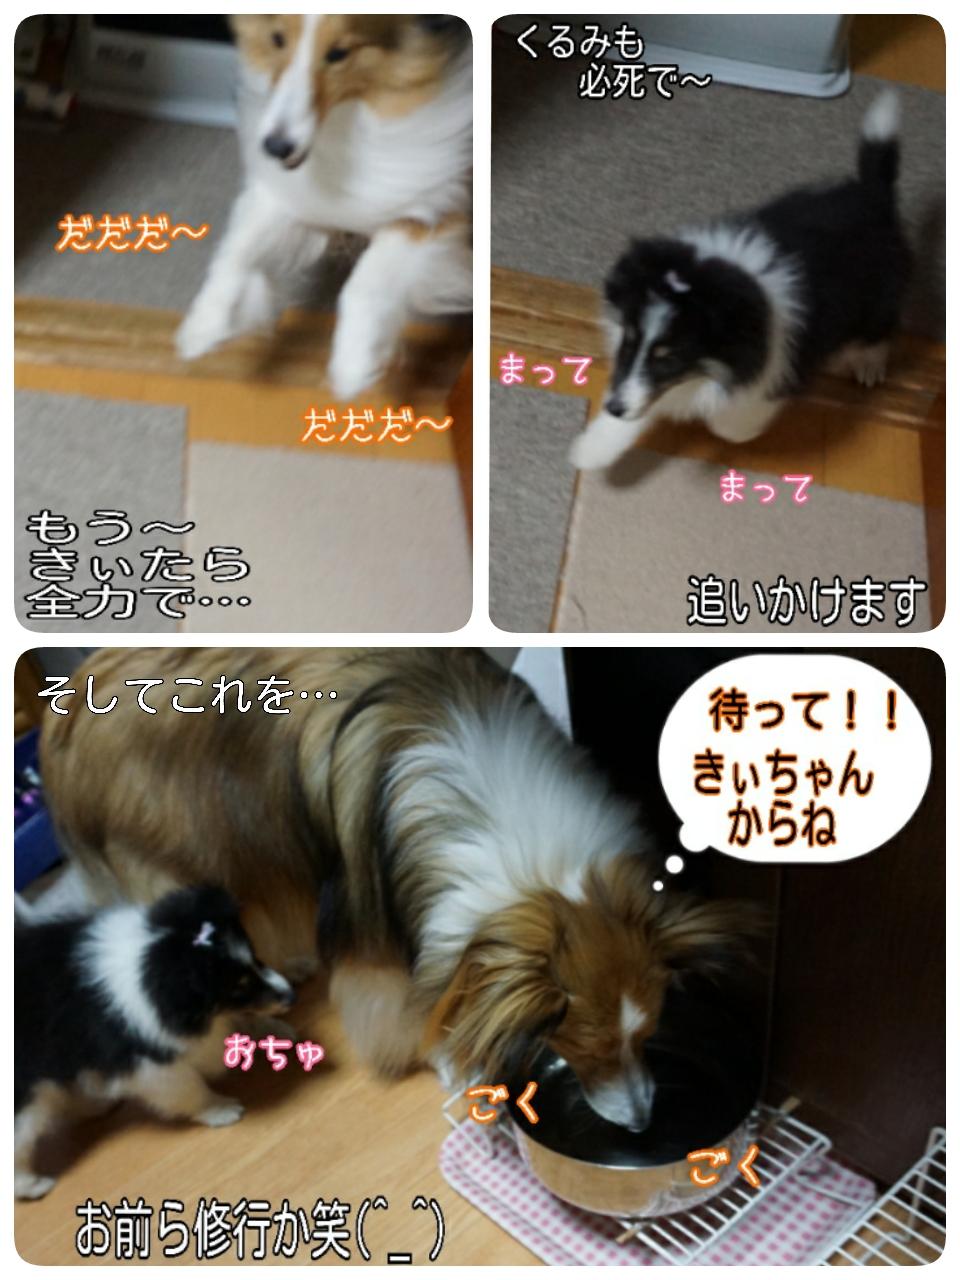 2015-05-09-05-50-17_deco.jpg